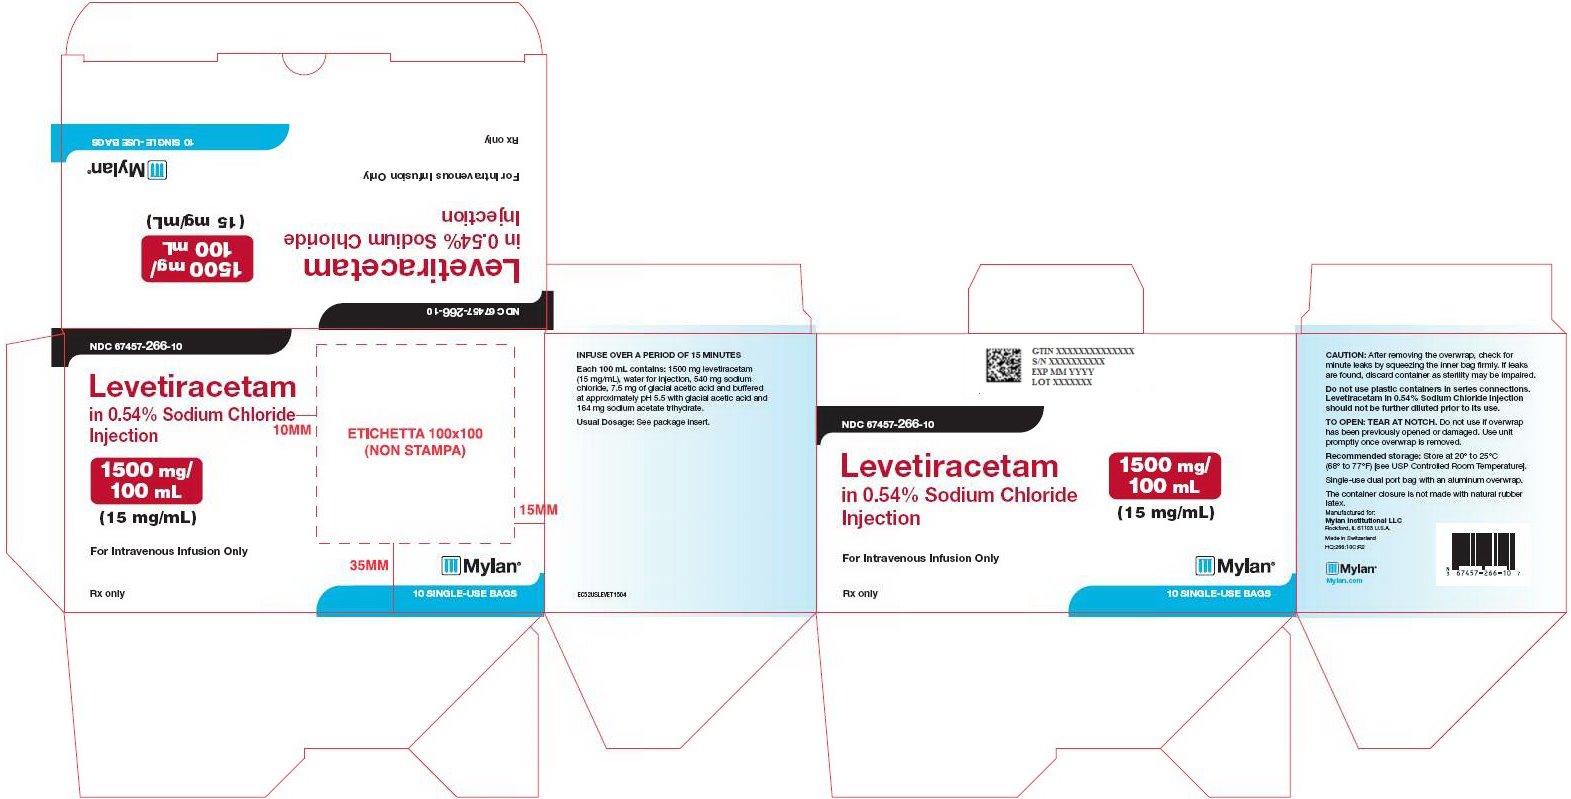 Levetiracetam Sodium Chloride Injection 1500 mg/100 mL Carton Label